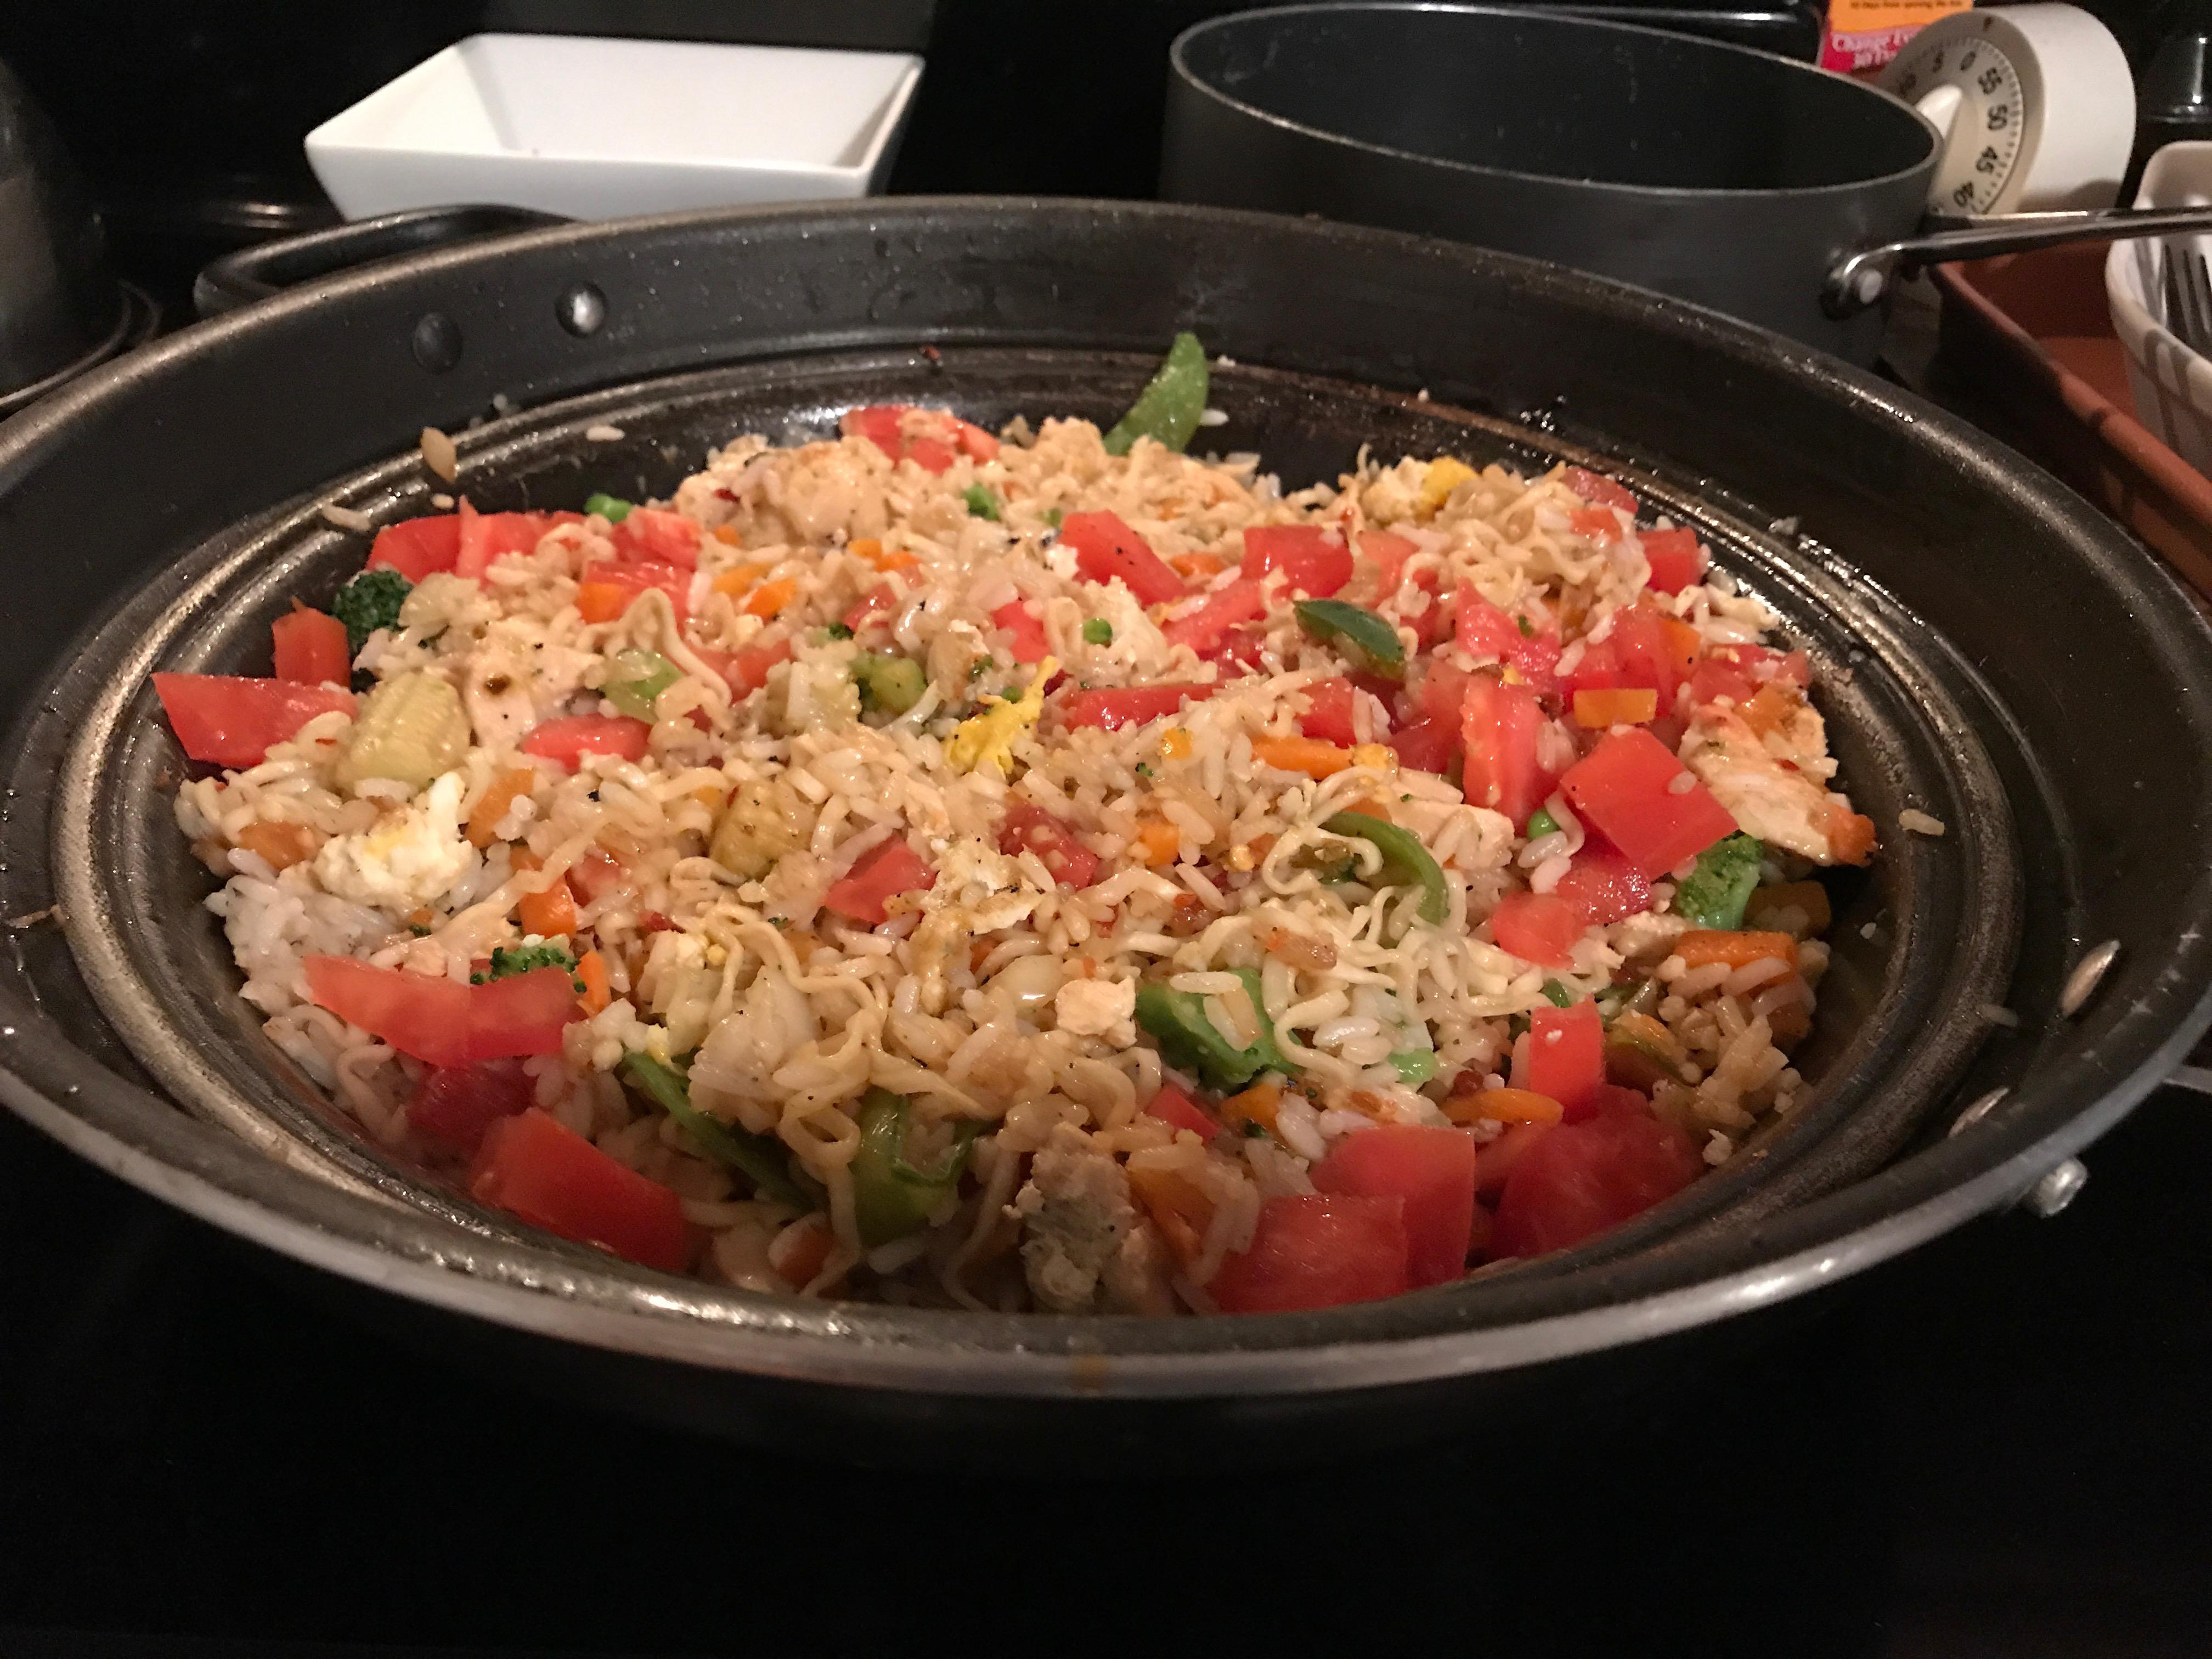 Making My Award-Winning Chicken Fried Rice